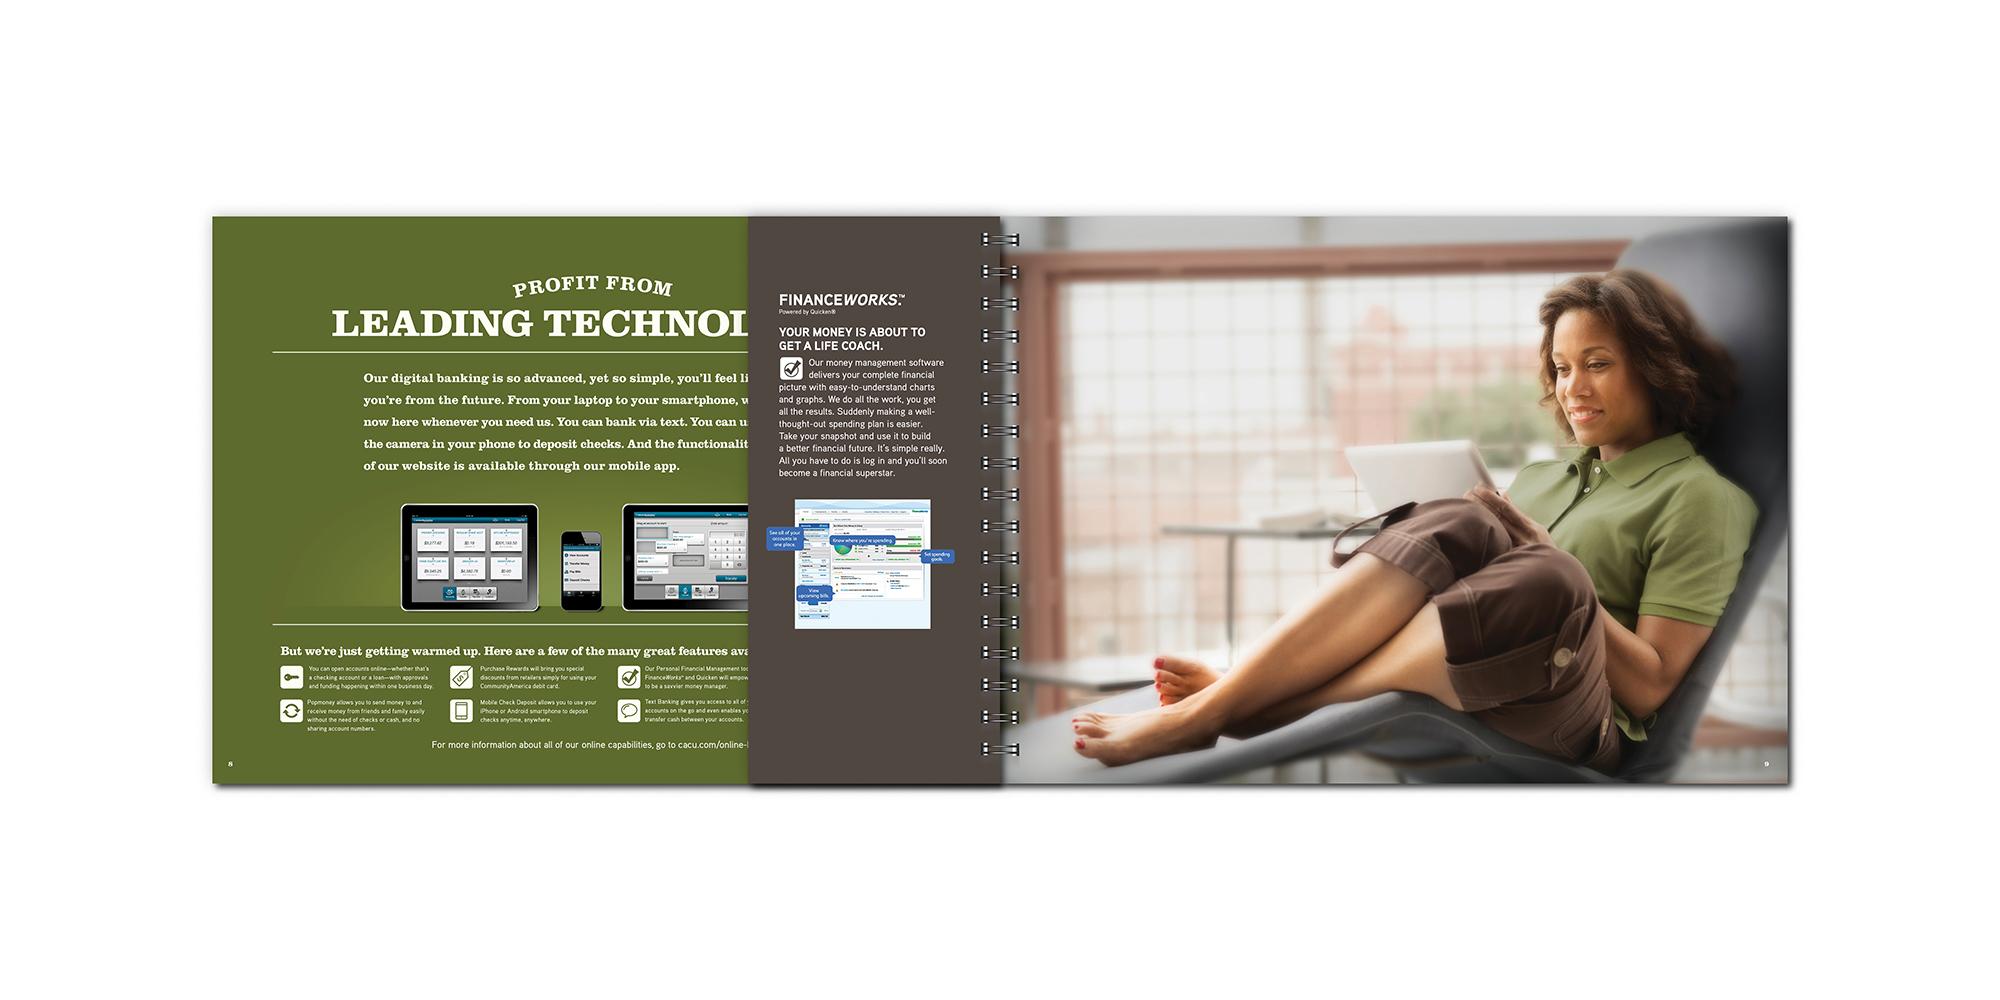 owner s manual graphis rh graphis com Service Manuals User Manual PDF